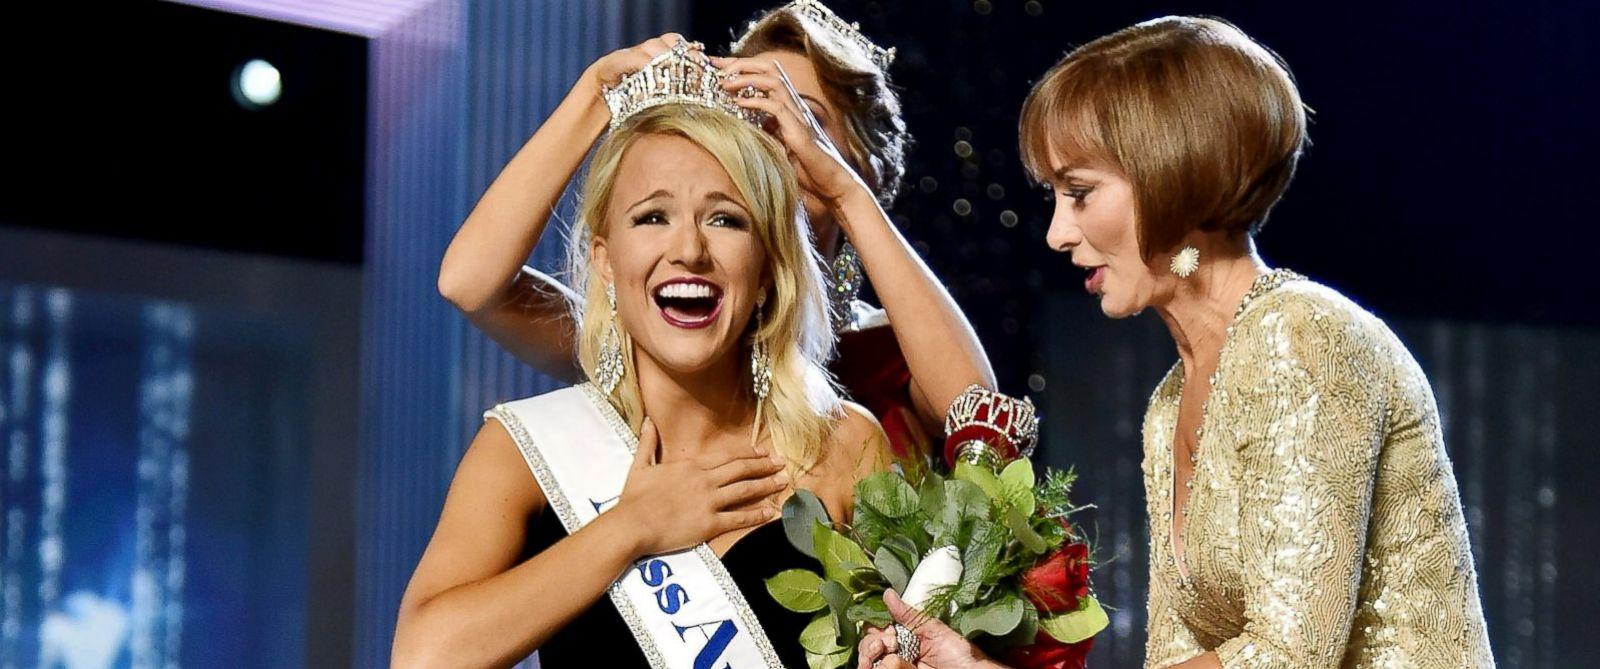 miss america winner 2017